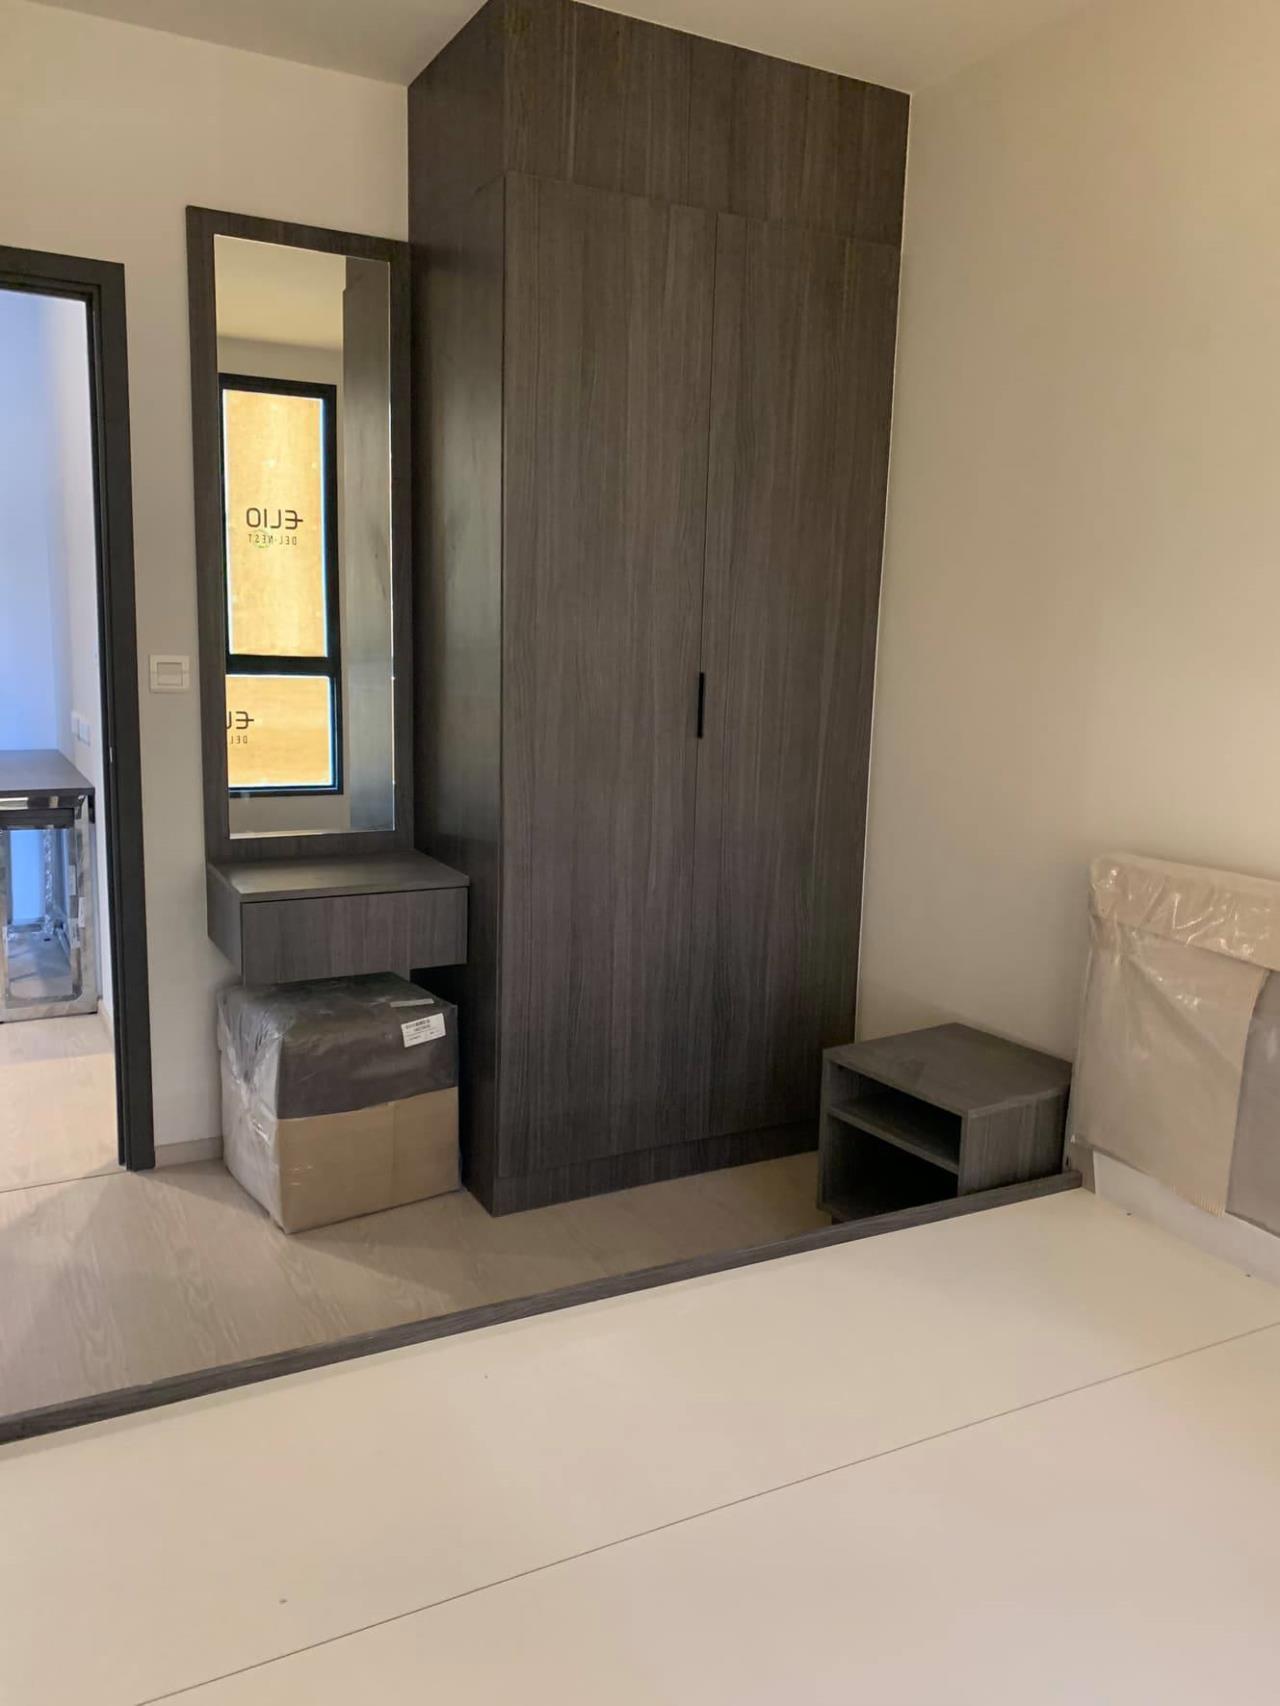 Blueocean property Agency's Condo For Rent – Elio Del Nest ( CODE : 20-06-0057-38 ) 10